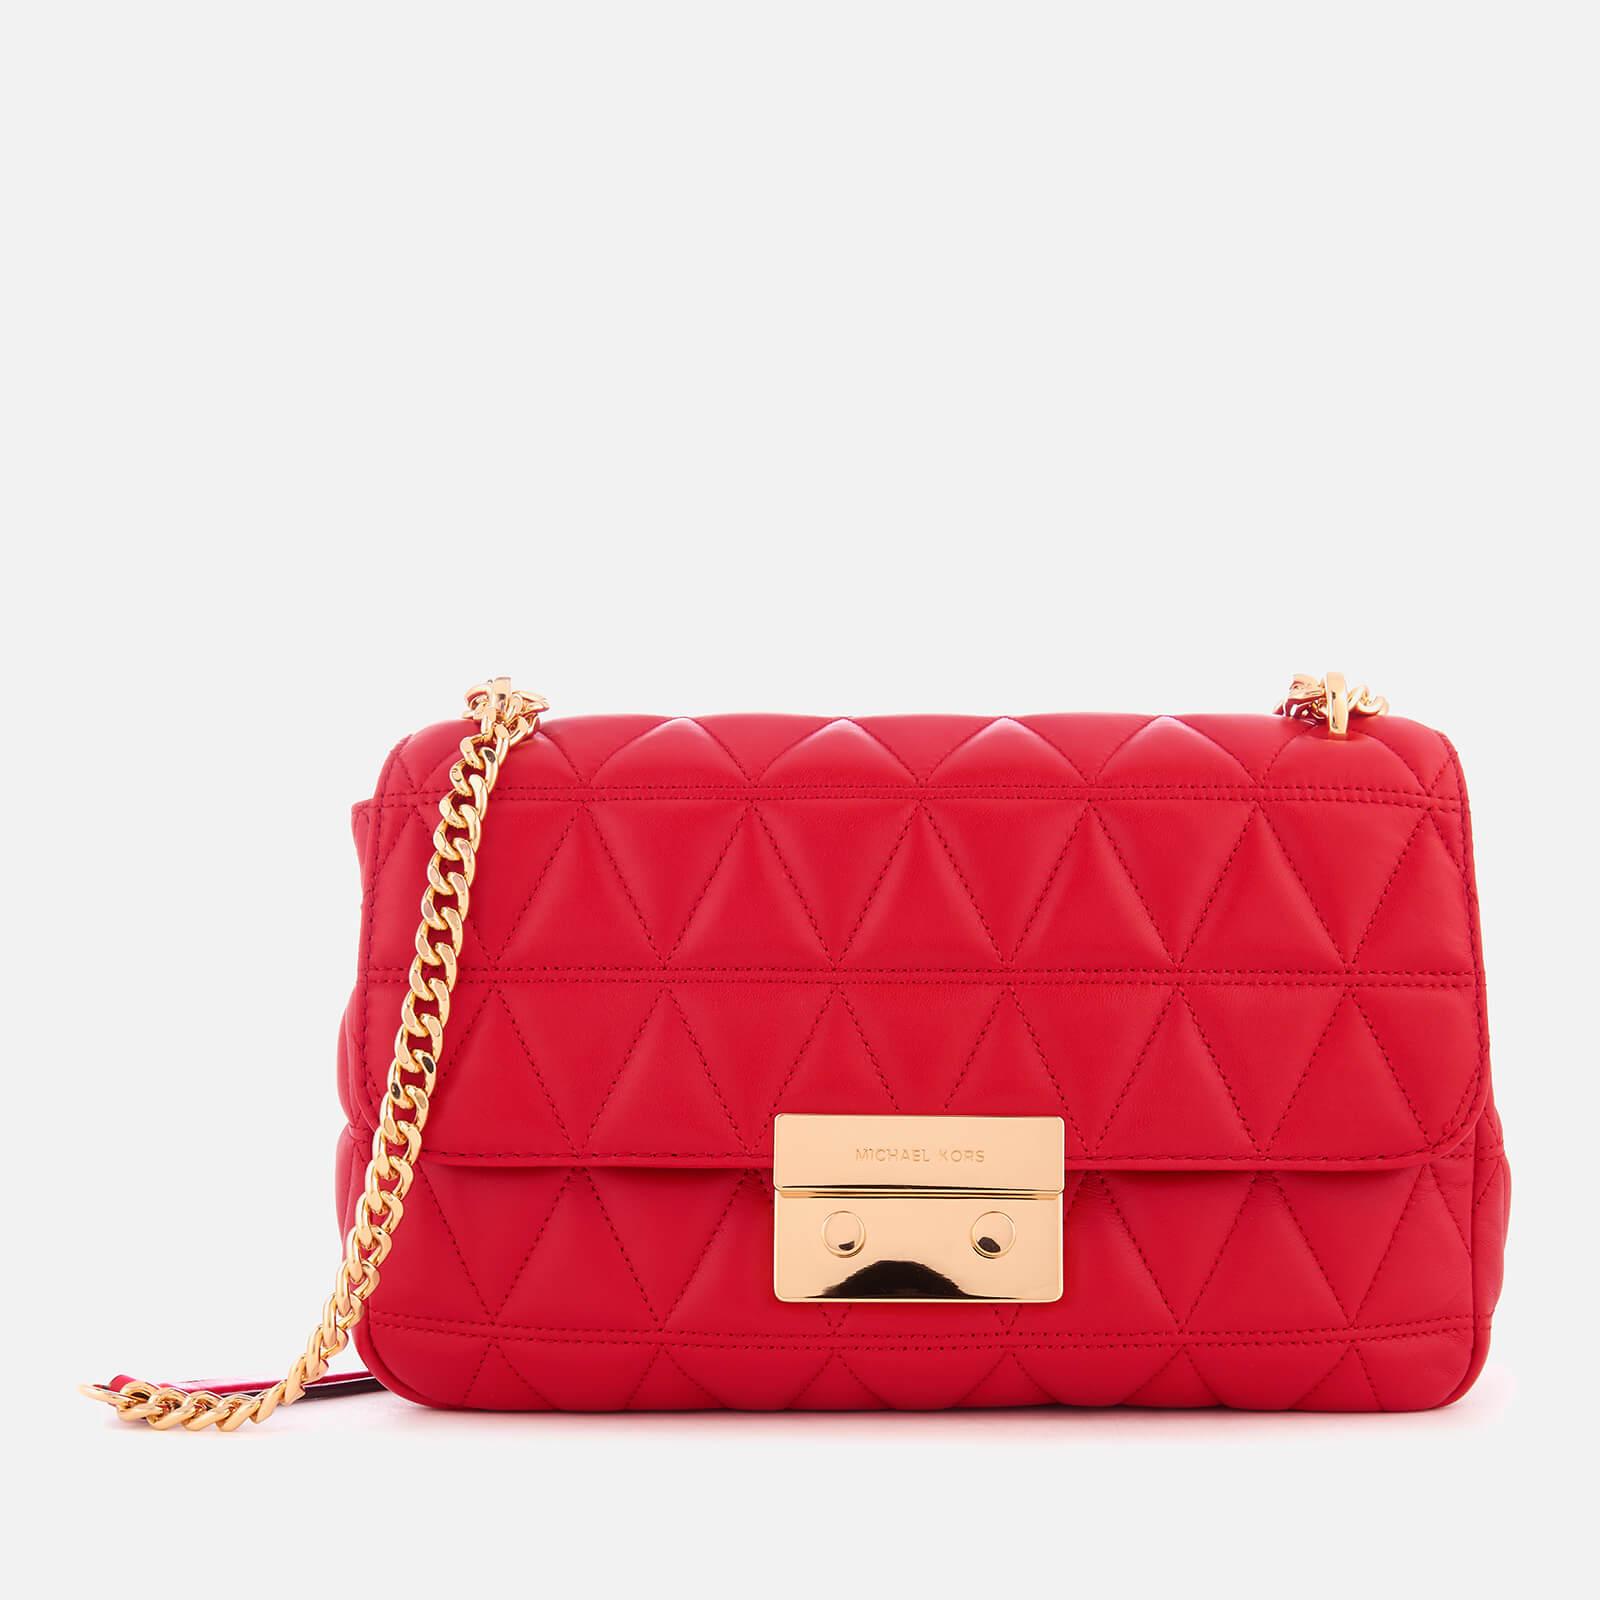 610c87901ec MICHAEL MICHAEL KORS Women s Sloan Large Chain Shoulder Bag - Bright Red -  Free UK Delivery over £50